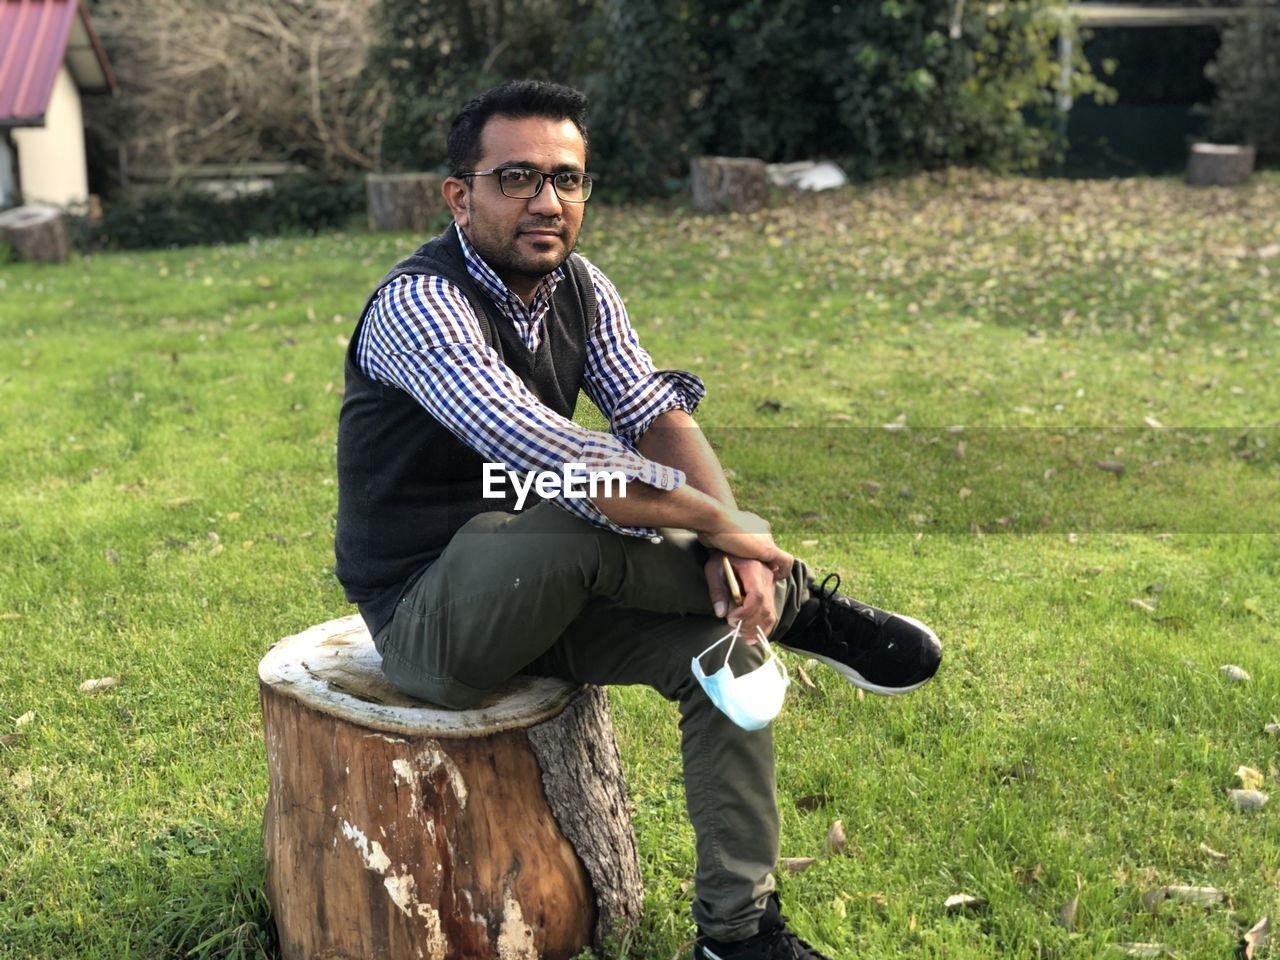 MAN SITTING ON FIELD